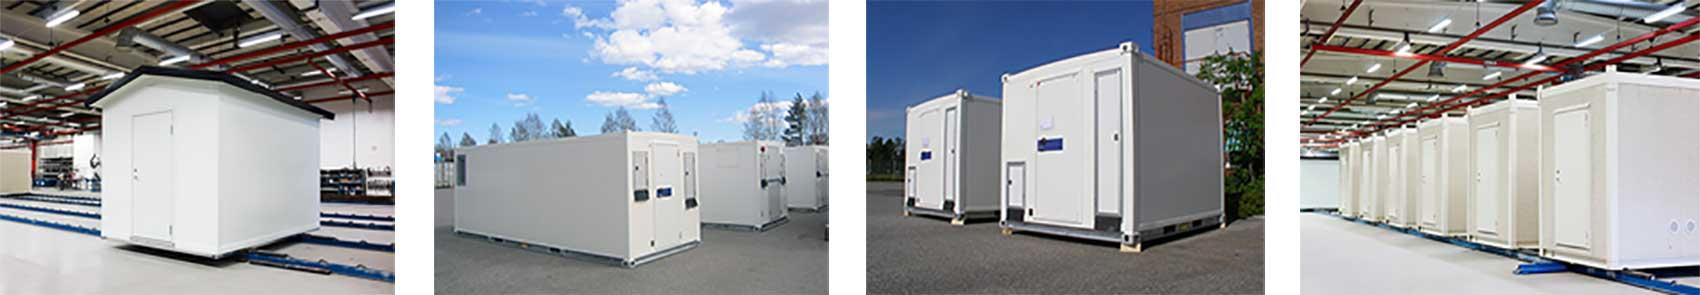 Prefabricerade modulära datacenter